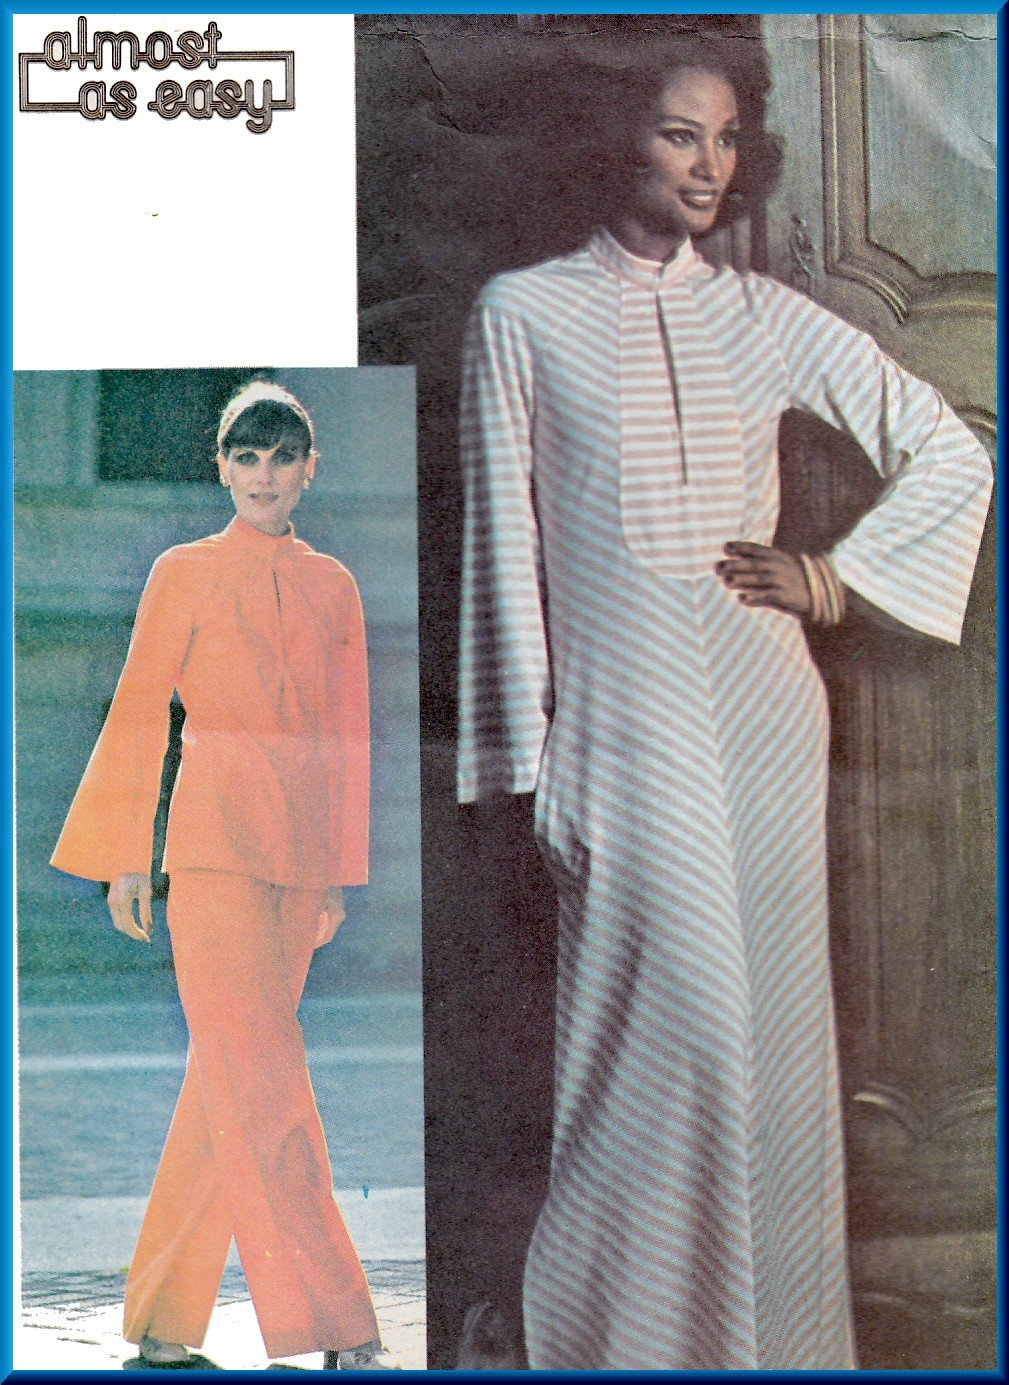 Vintage McCall's Sewing Pattern 4950 Size 12 Misses' 70s Dress Caftan Top Bell Sleeves Wide Pants